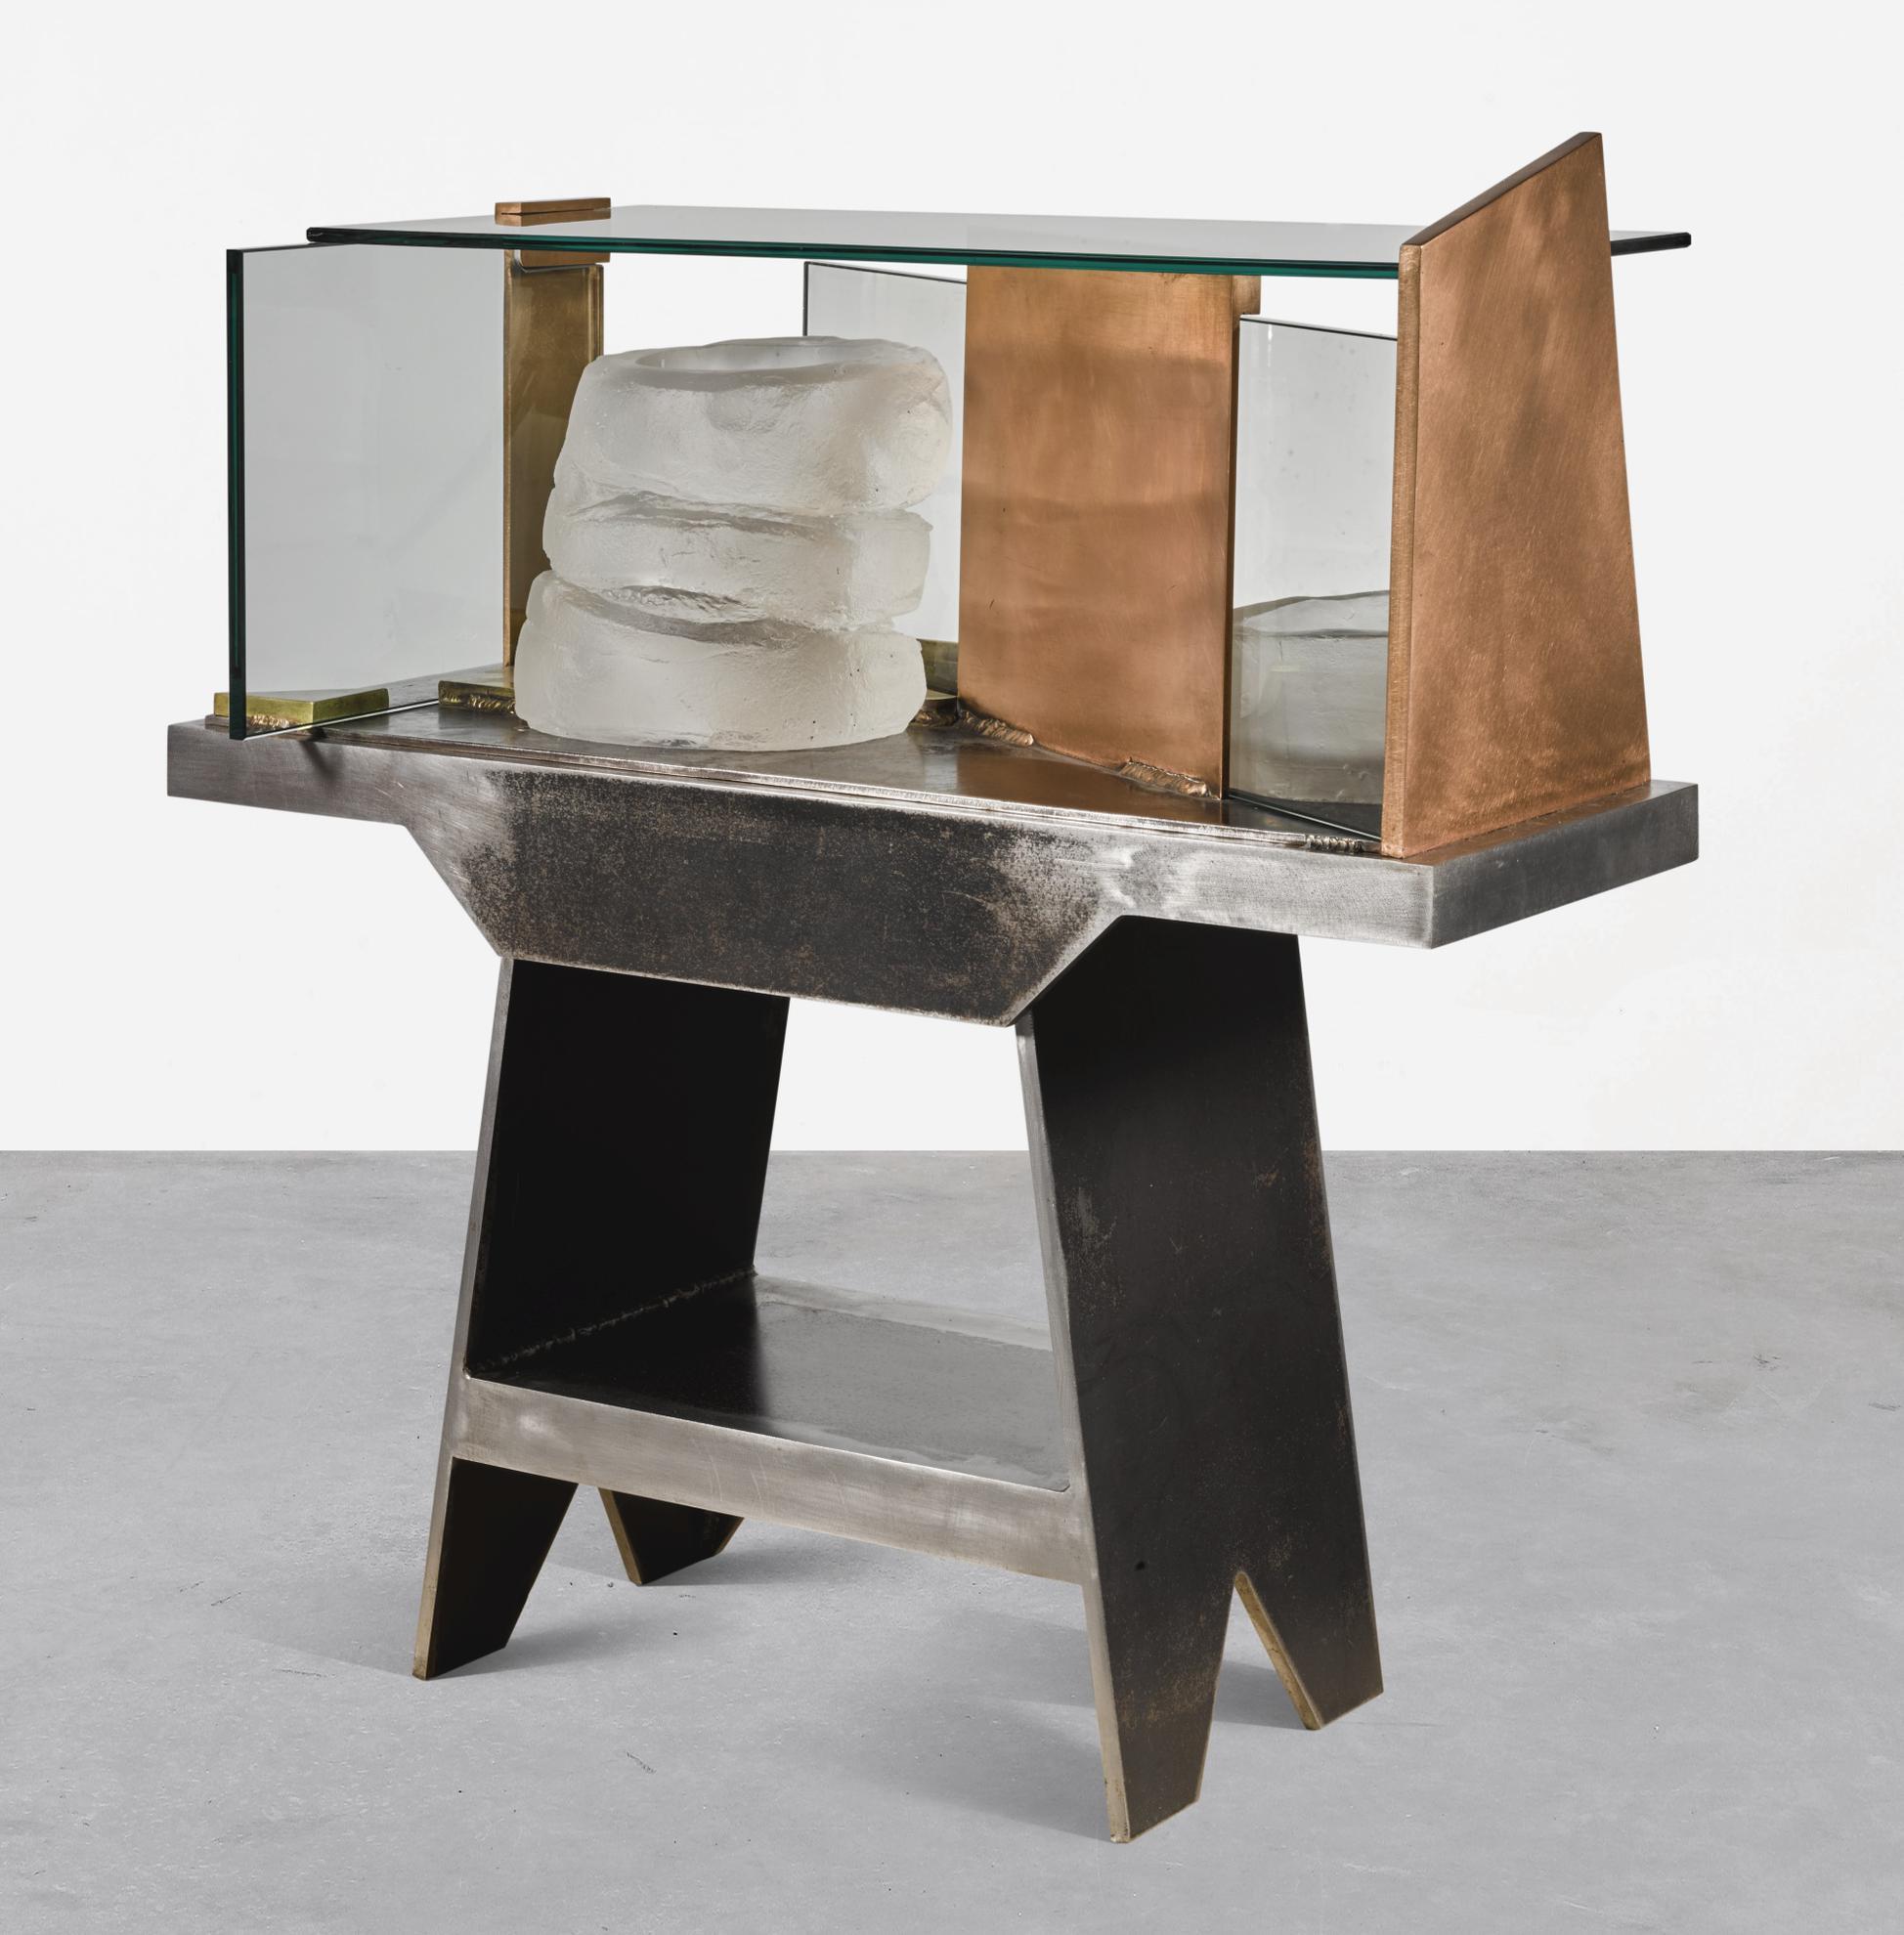 Anthony Caro-Display-2012